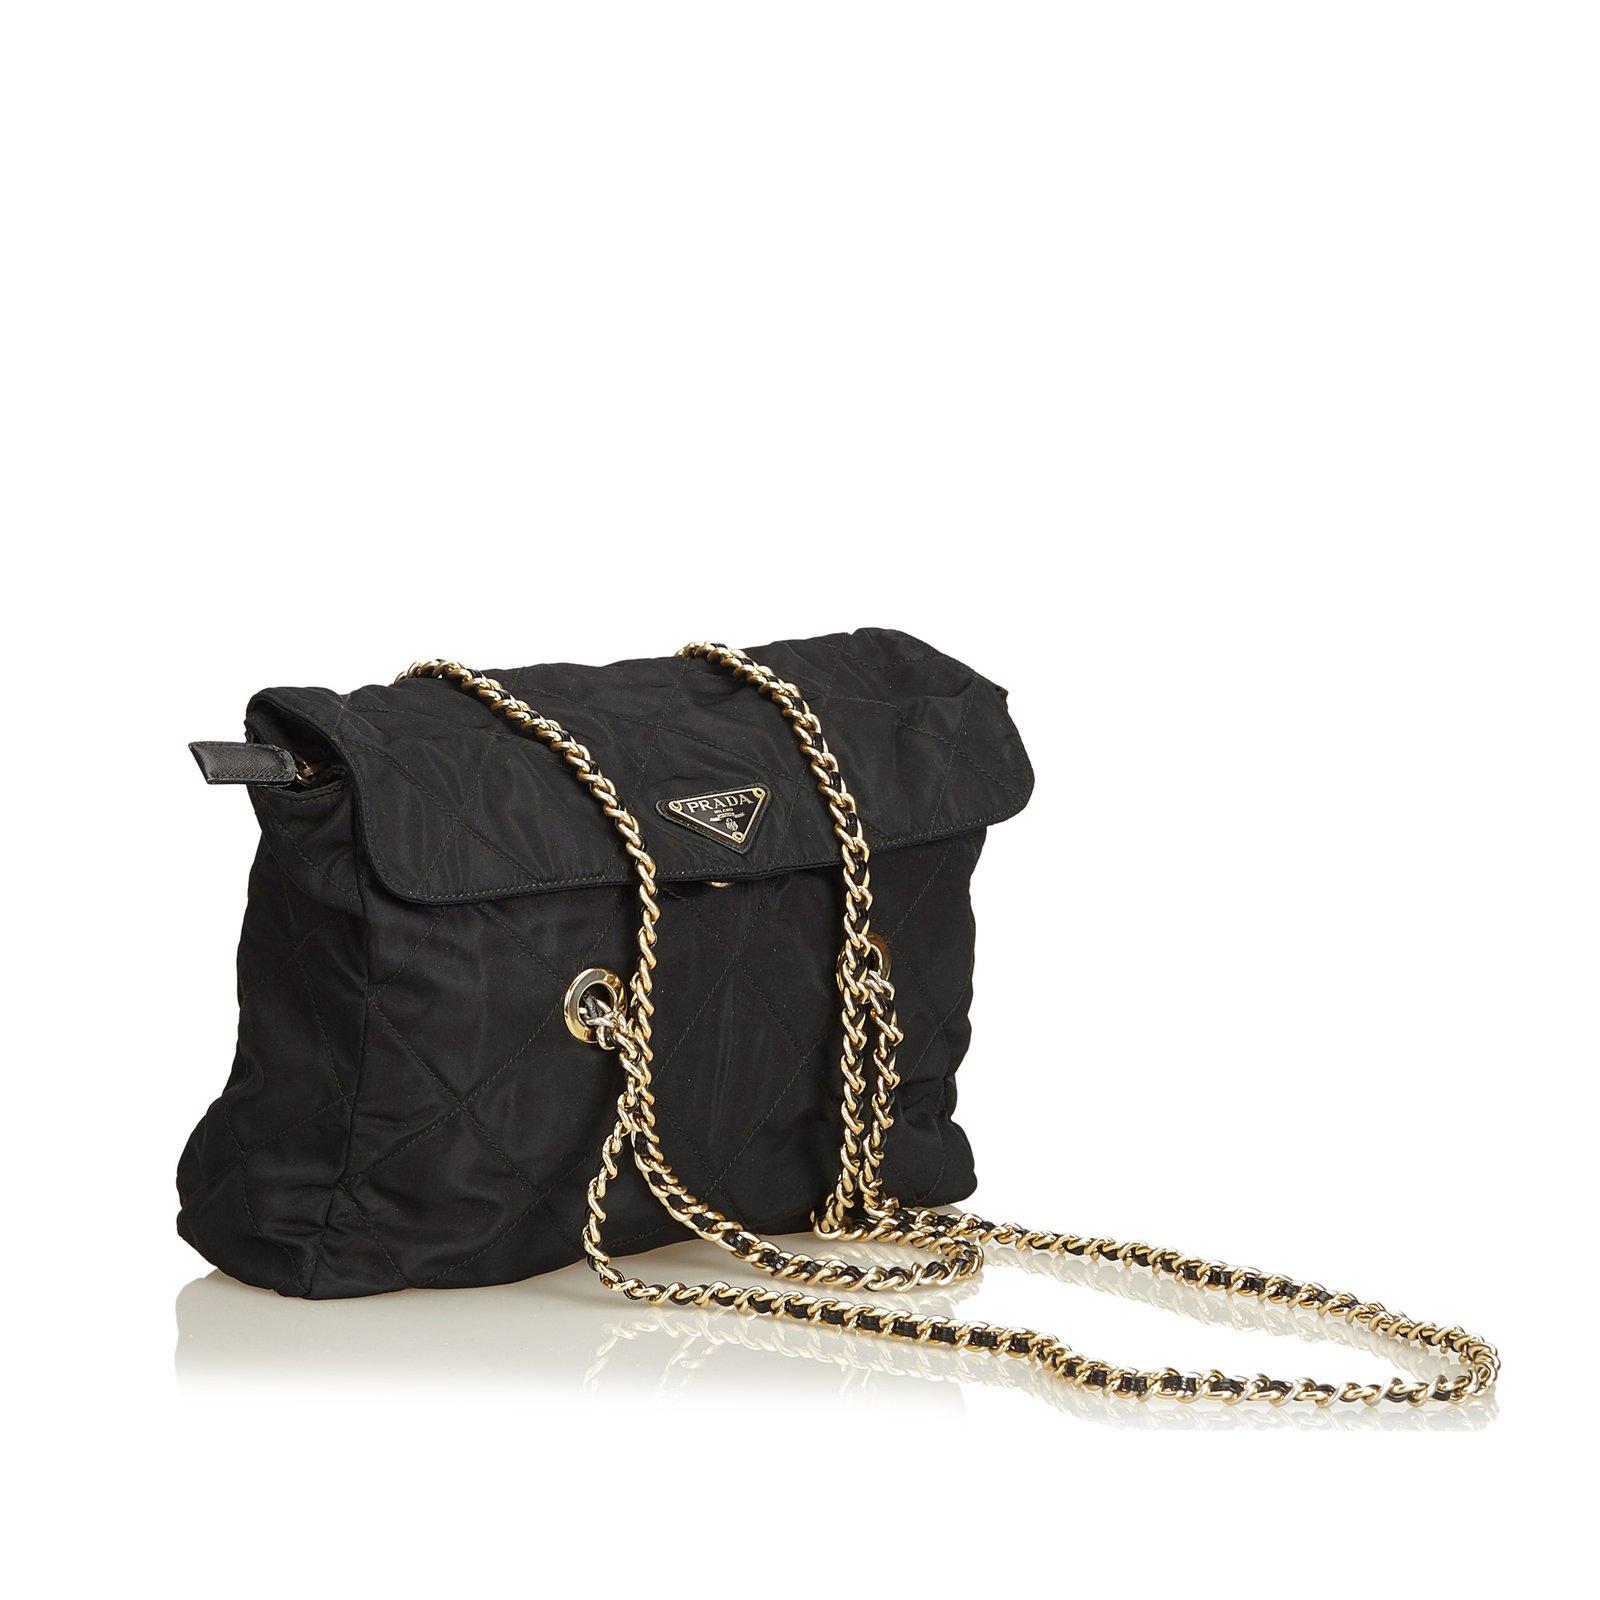 23344385265b Prada Quilted Nylon Chain Tote Bag Totes nylon